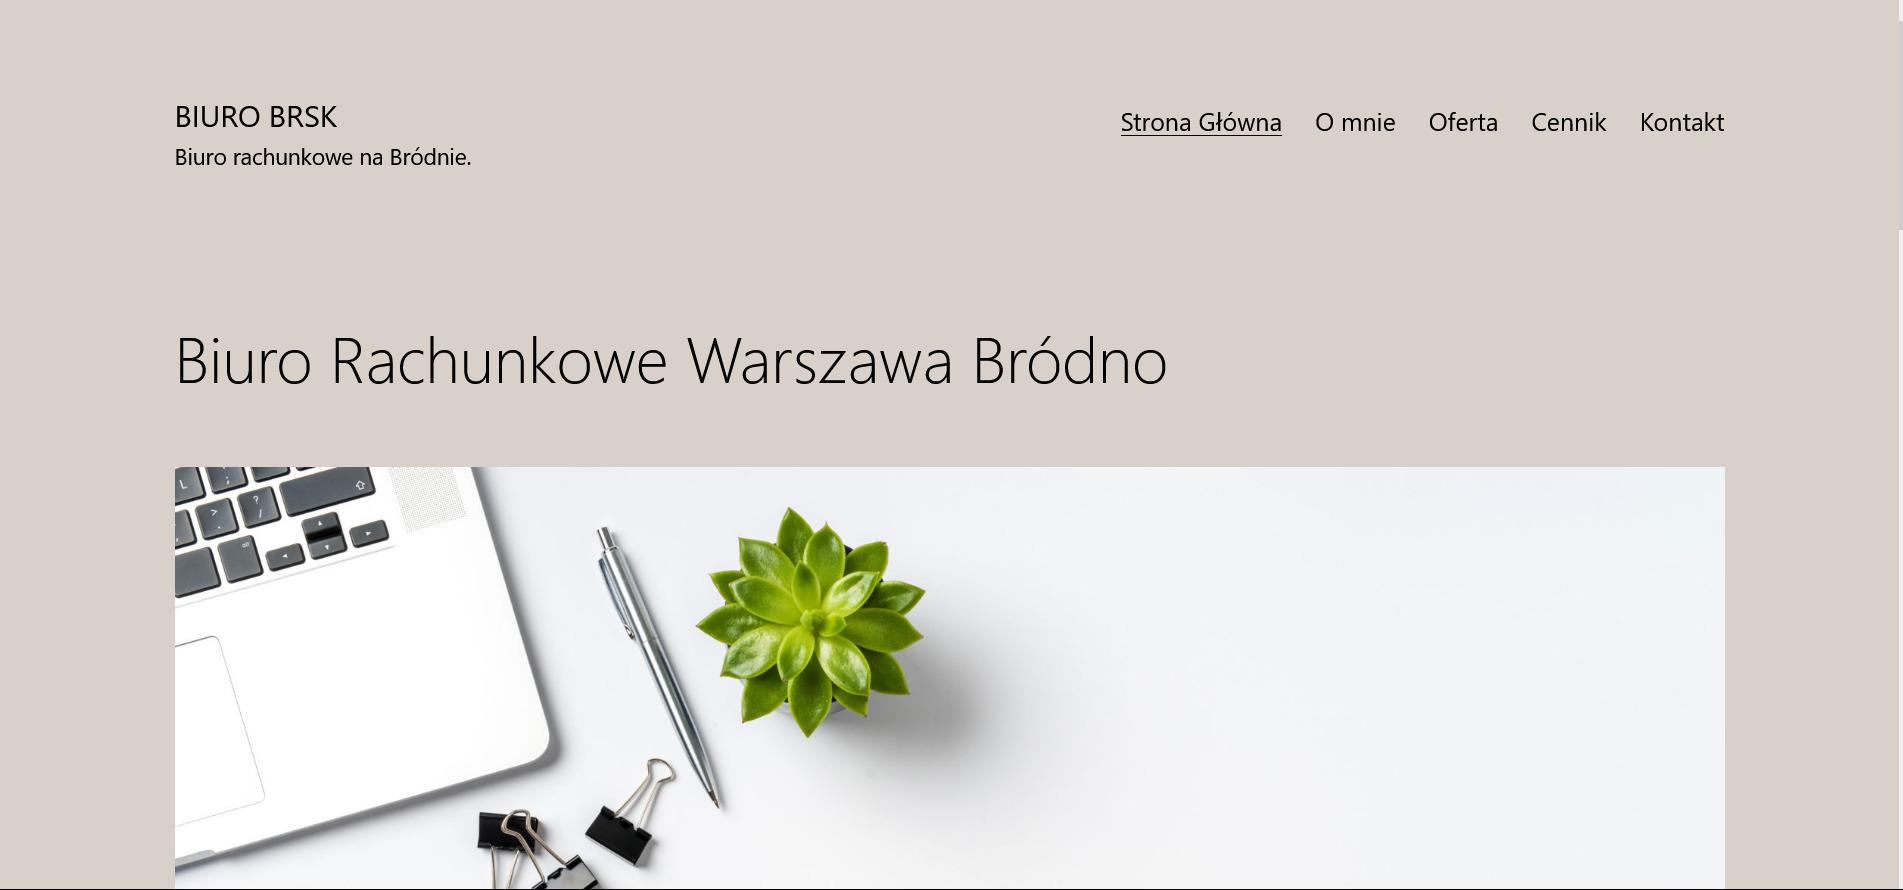 Biuro-Brsk-Biuro-Rachunkowe-Warszawa-Bródno-Top